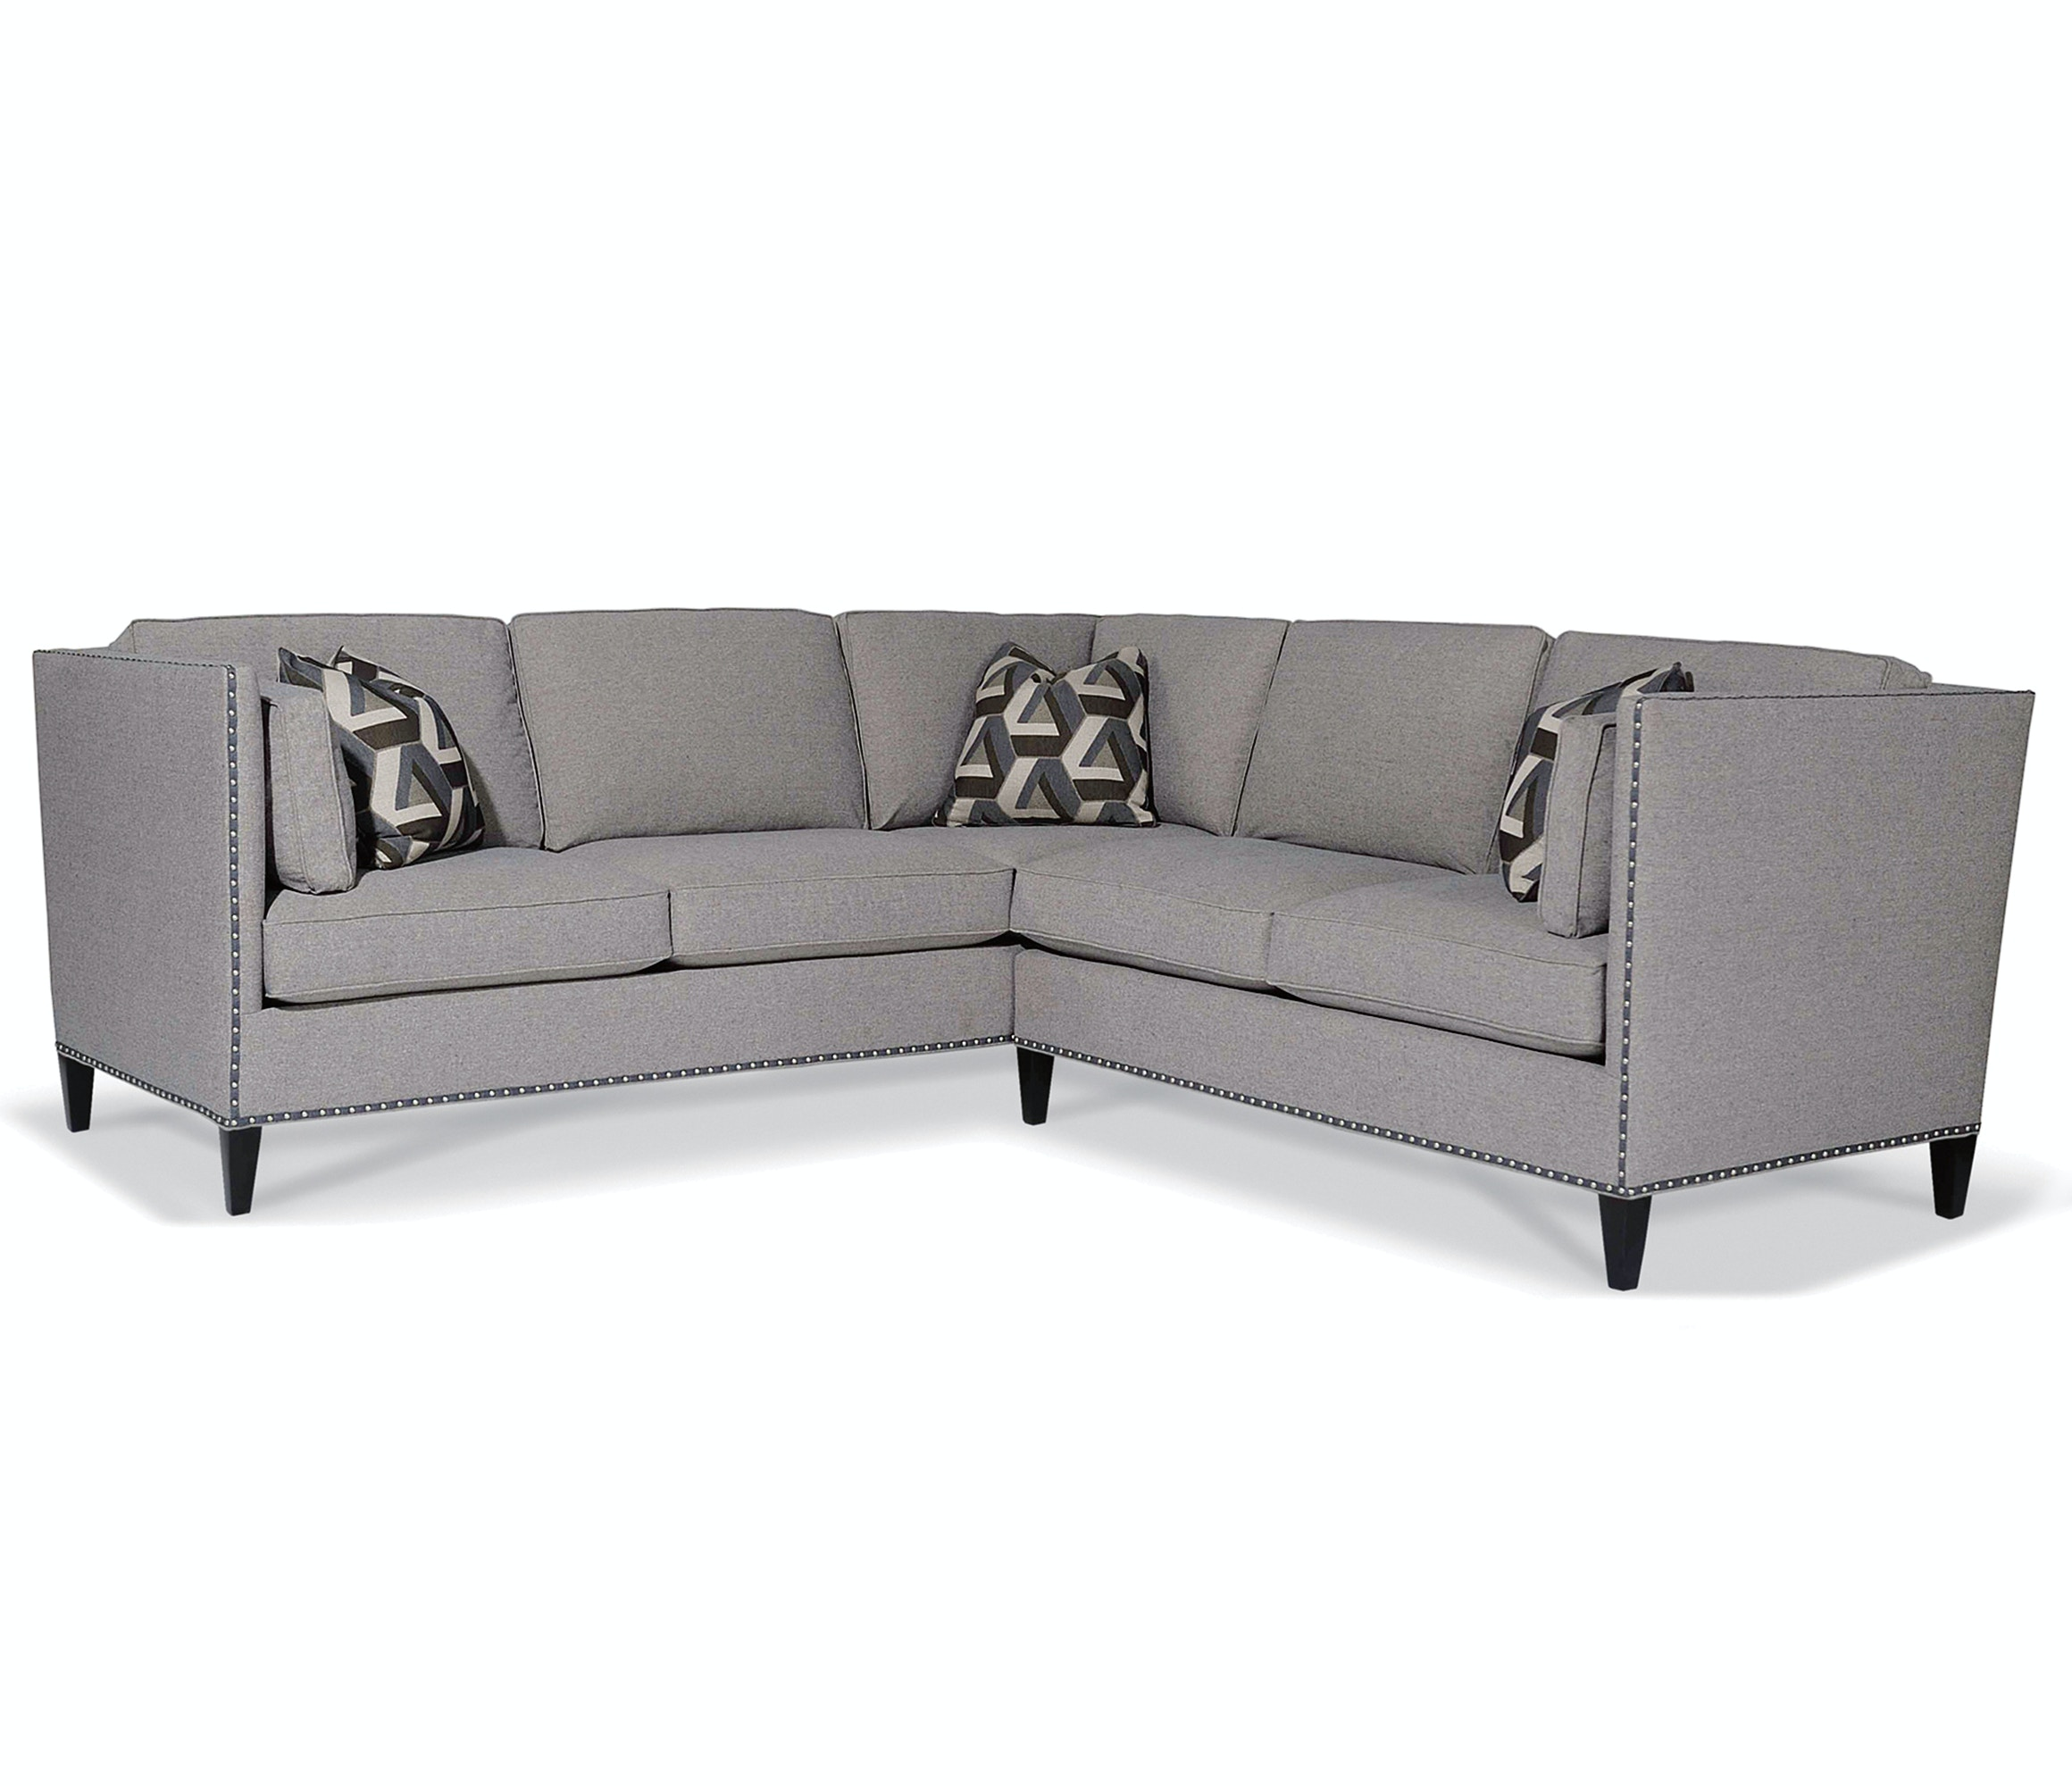 taylor king sofa childrens bedroom bed living room beekman sectional k8433